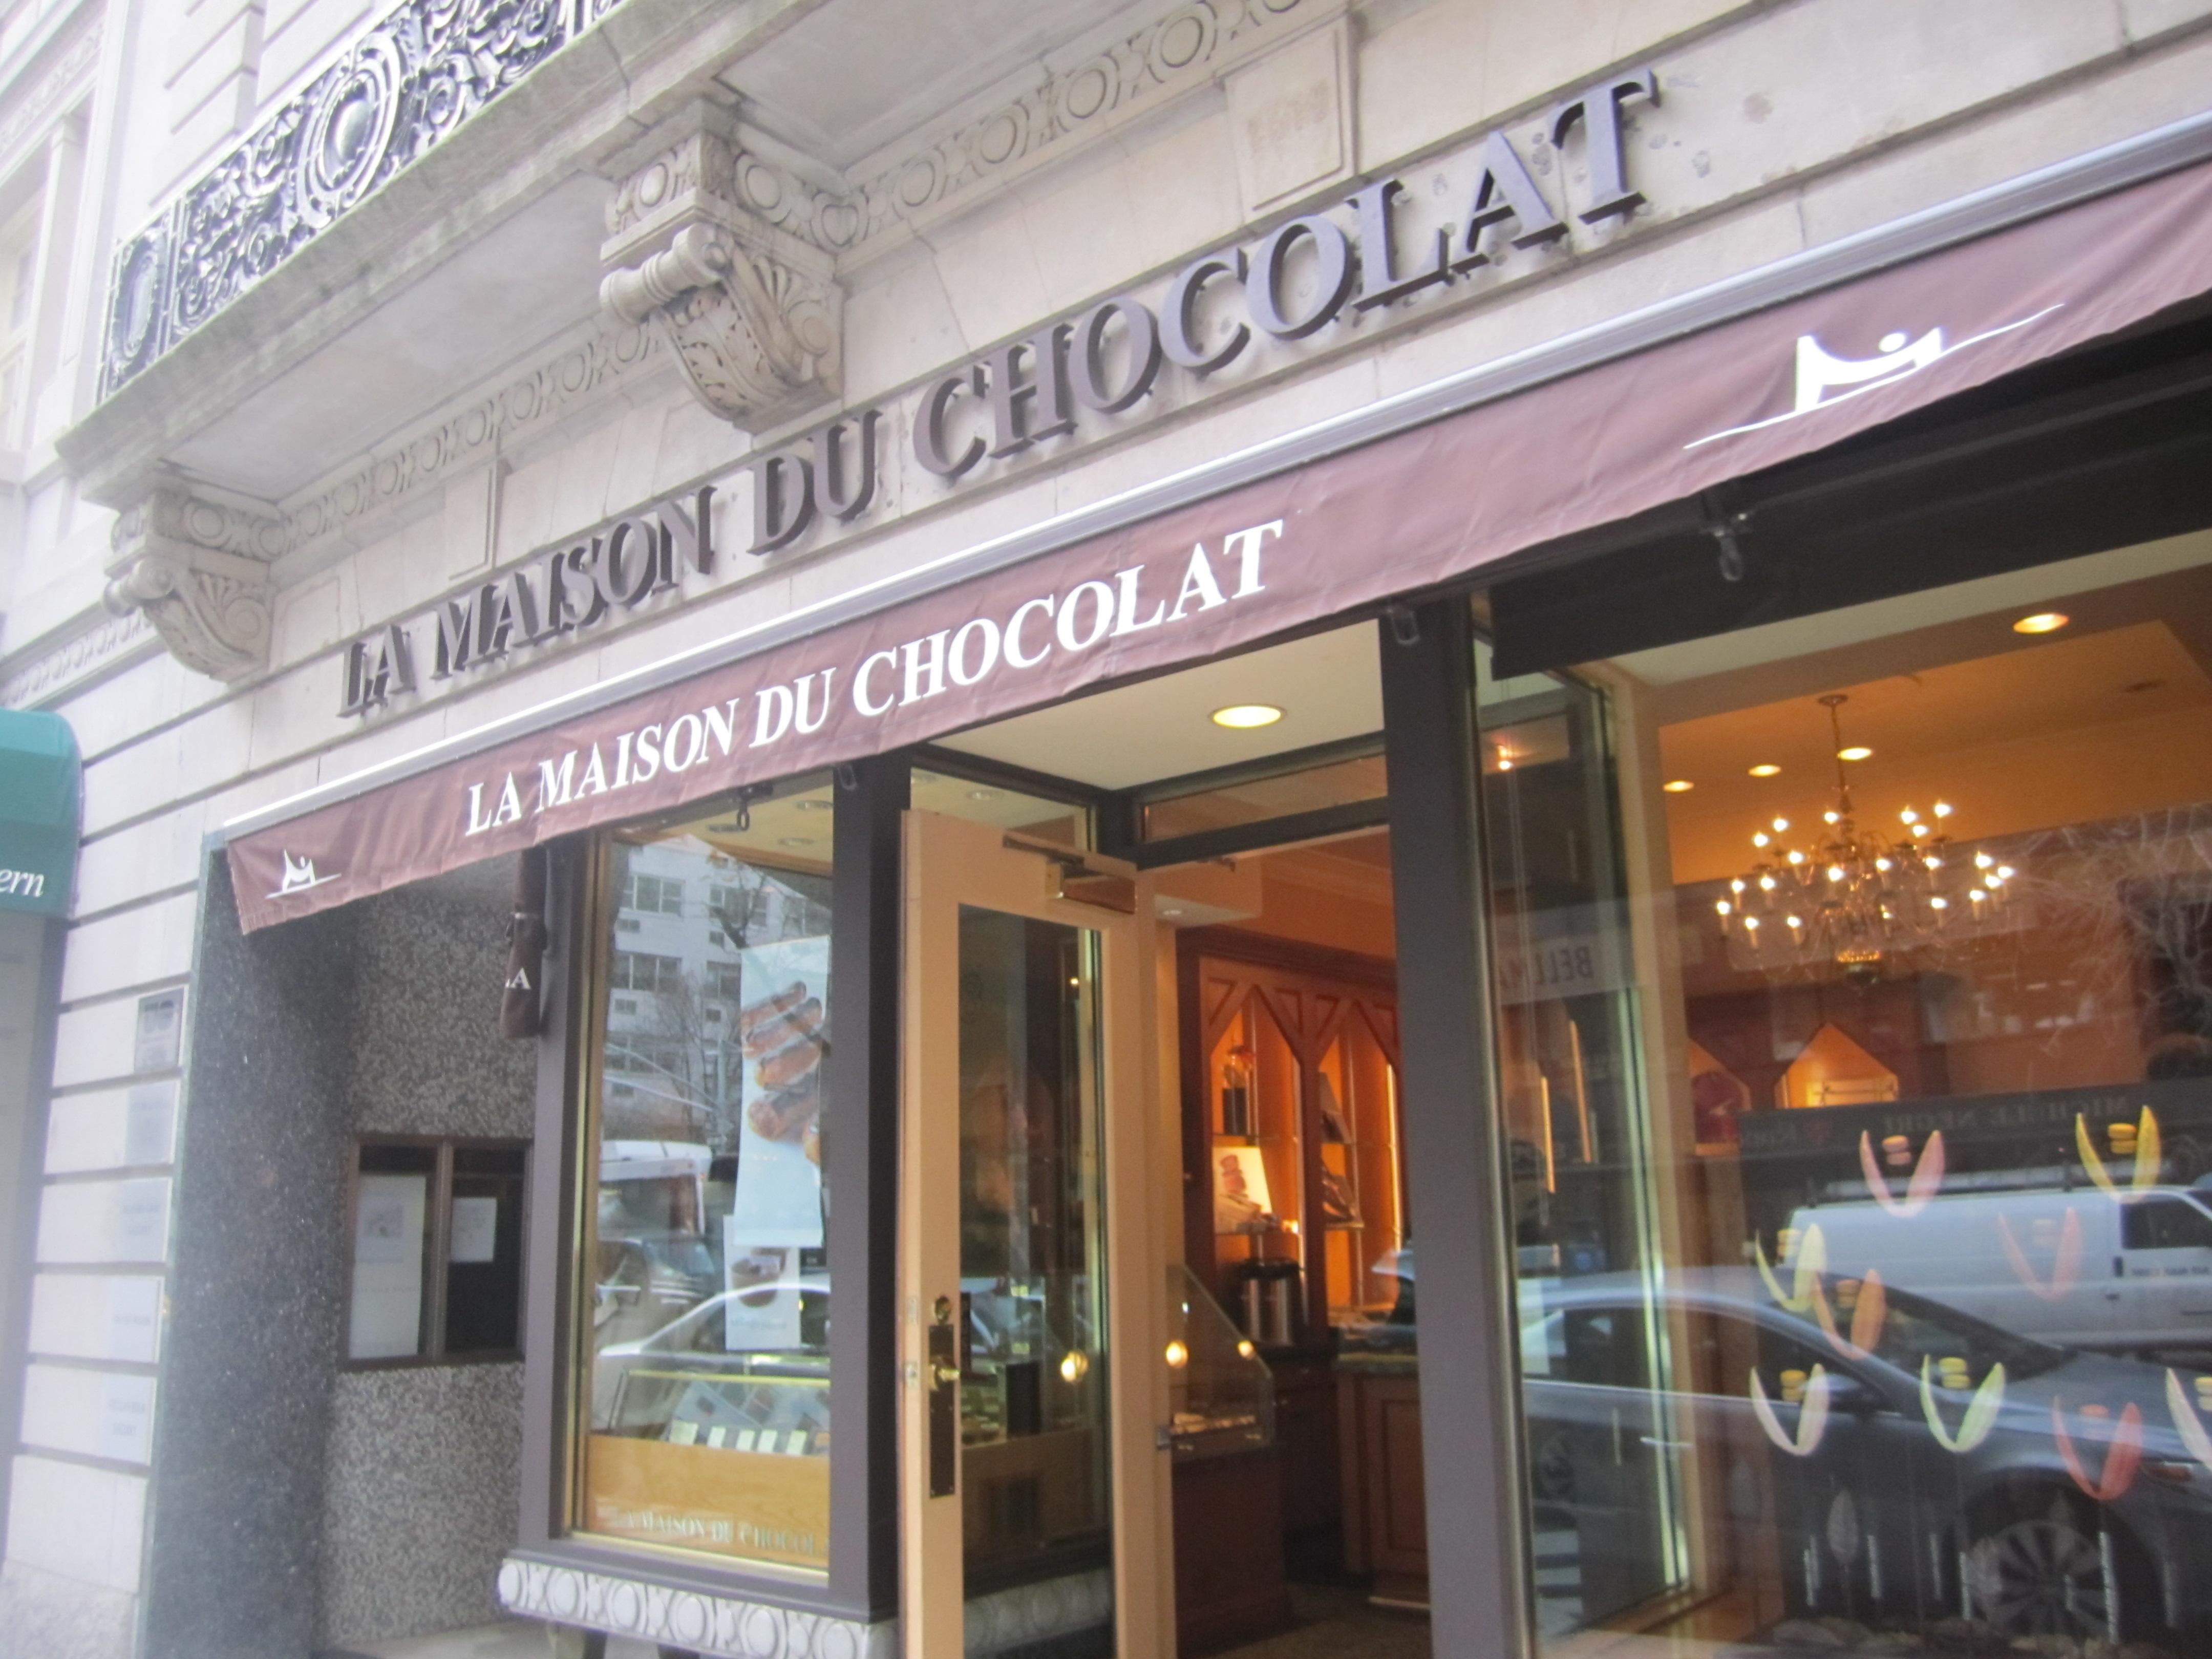 La maison du chocolat upper east side new york city for Macarons la maison du chocolat